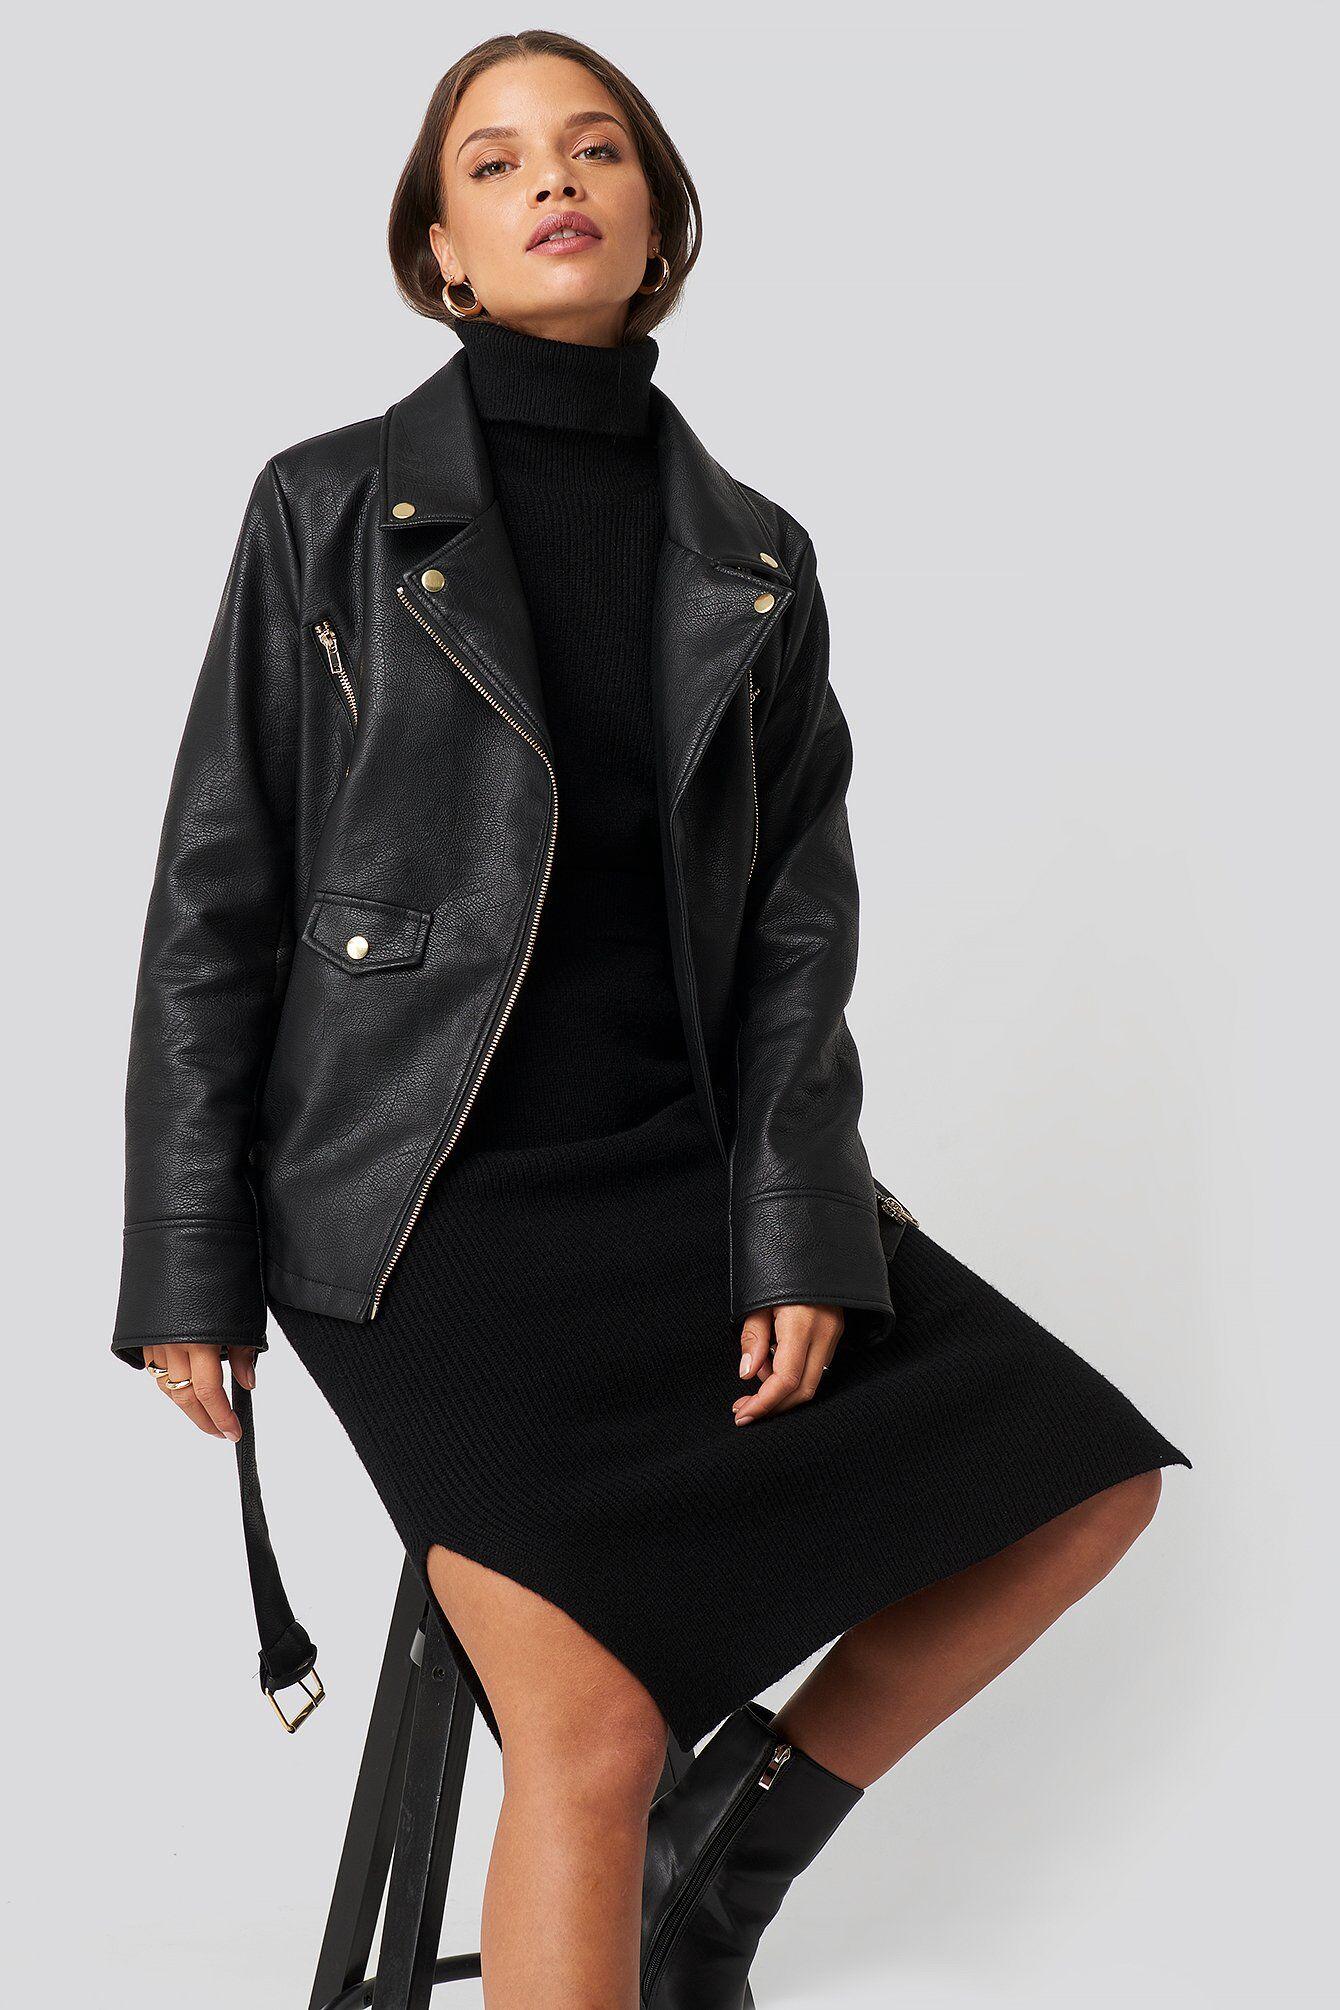 donna_romina_oversized_detail_faux_leather_jacket_black_1610-000045-0002_01j